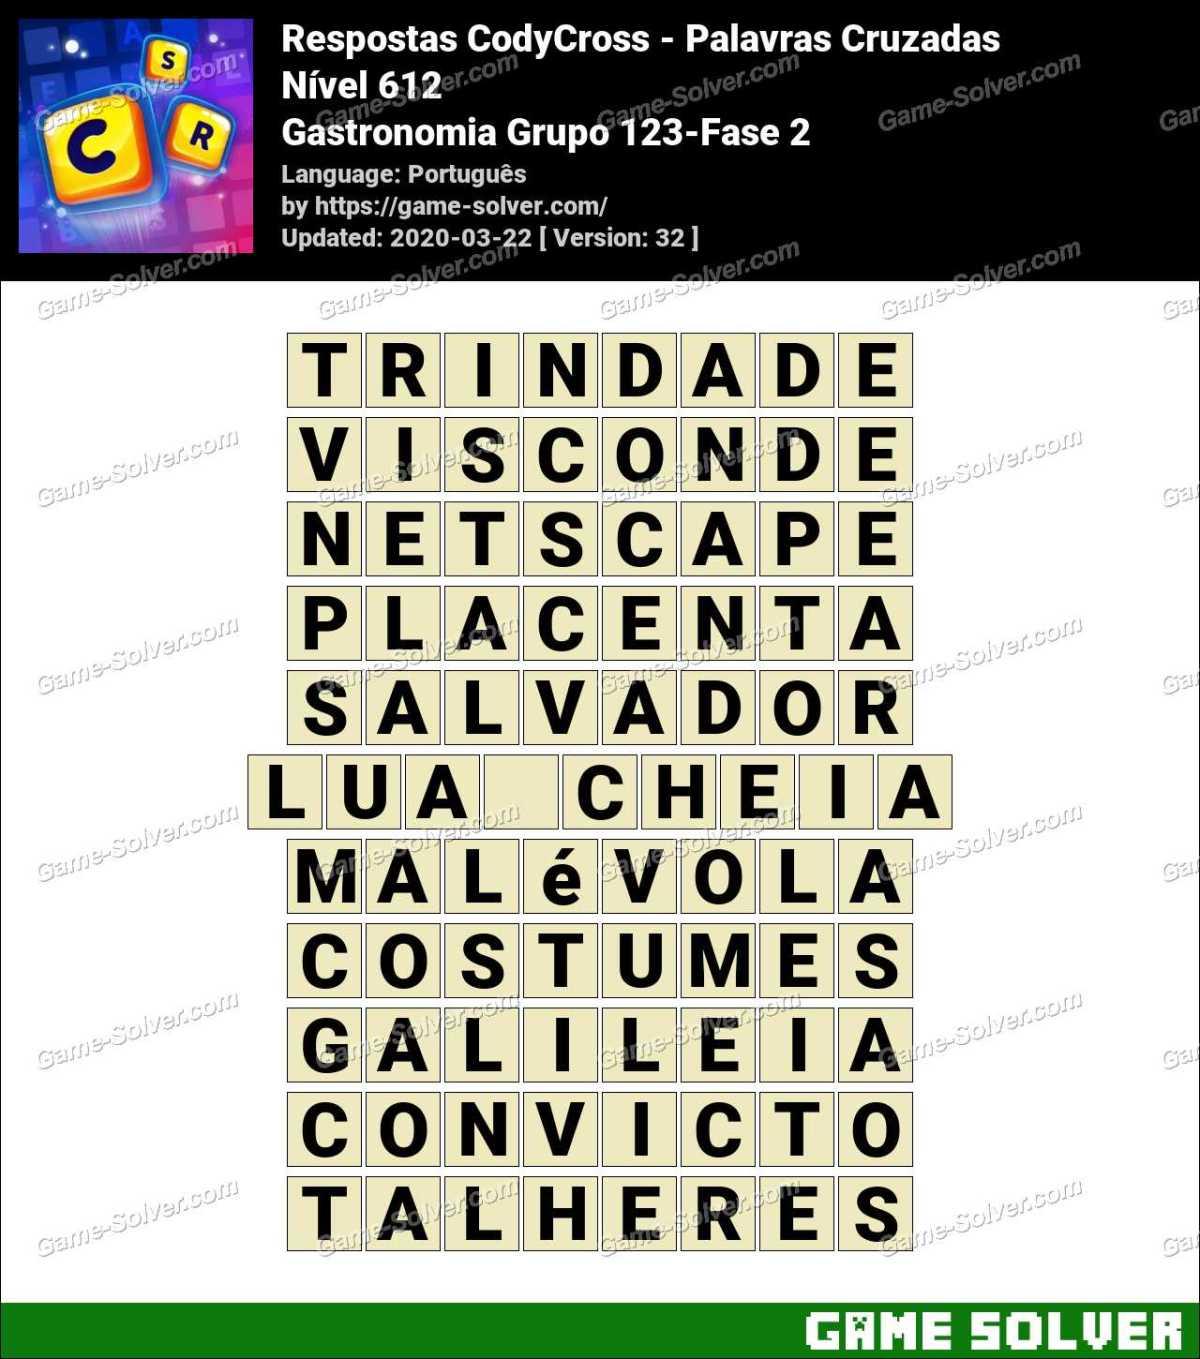 Respostas CodyCross Gastronomia Grupo 123-Fase 2